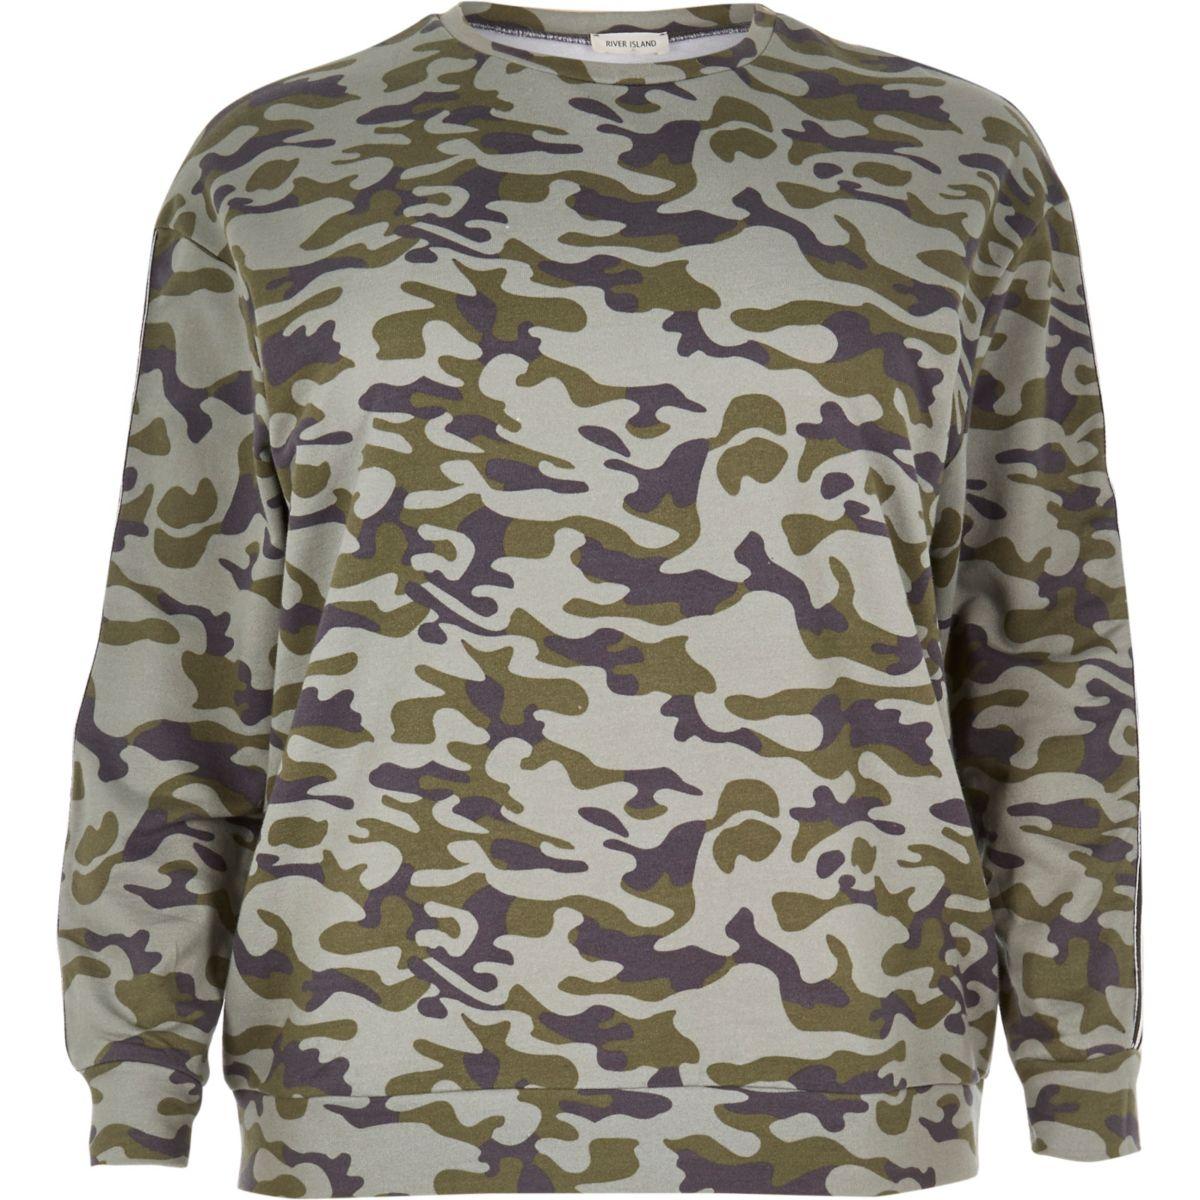 Plus green camo sweatshirt